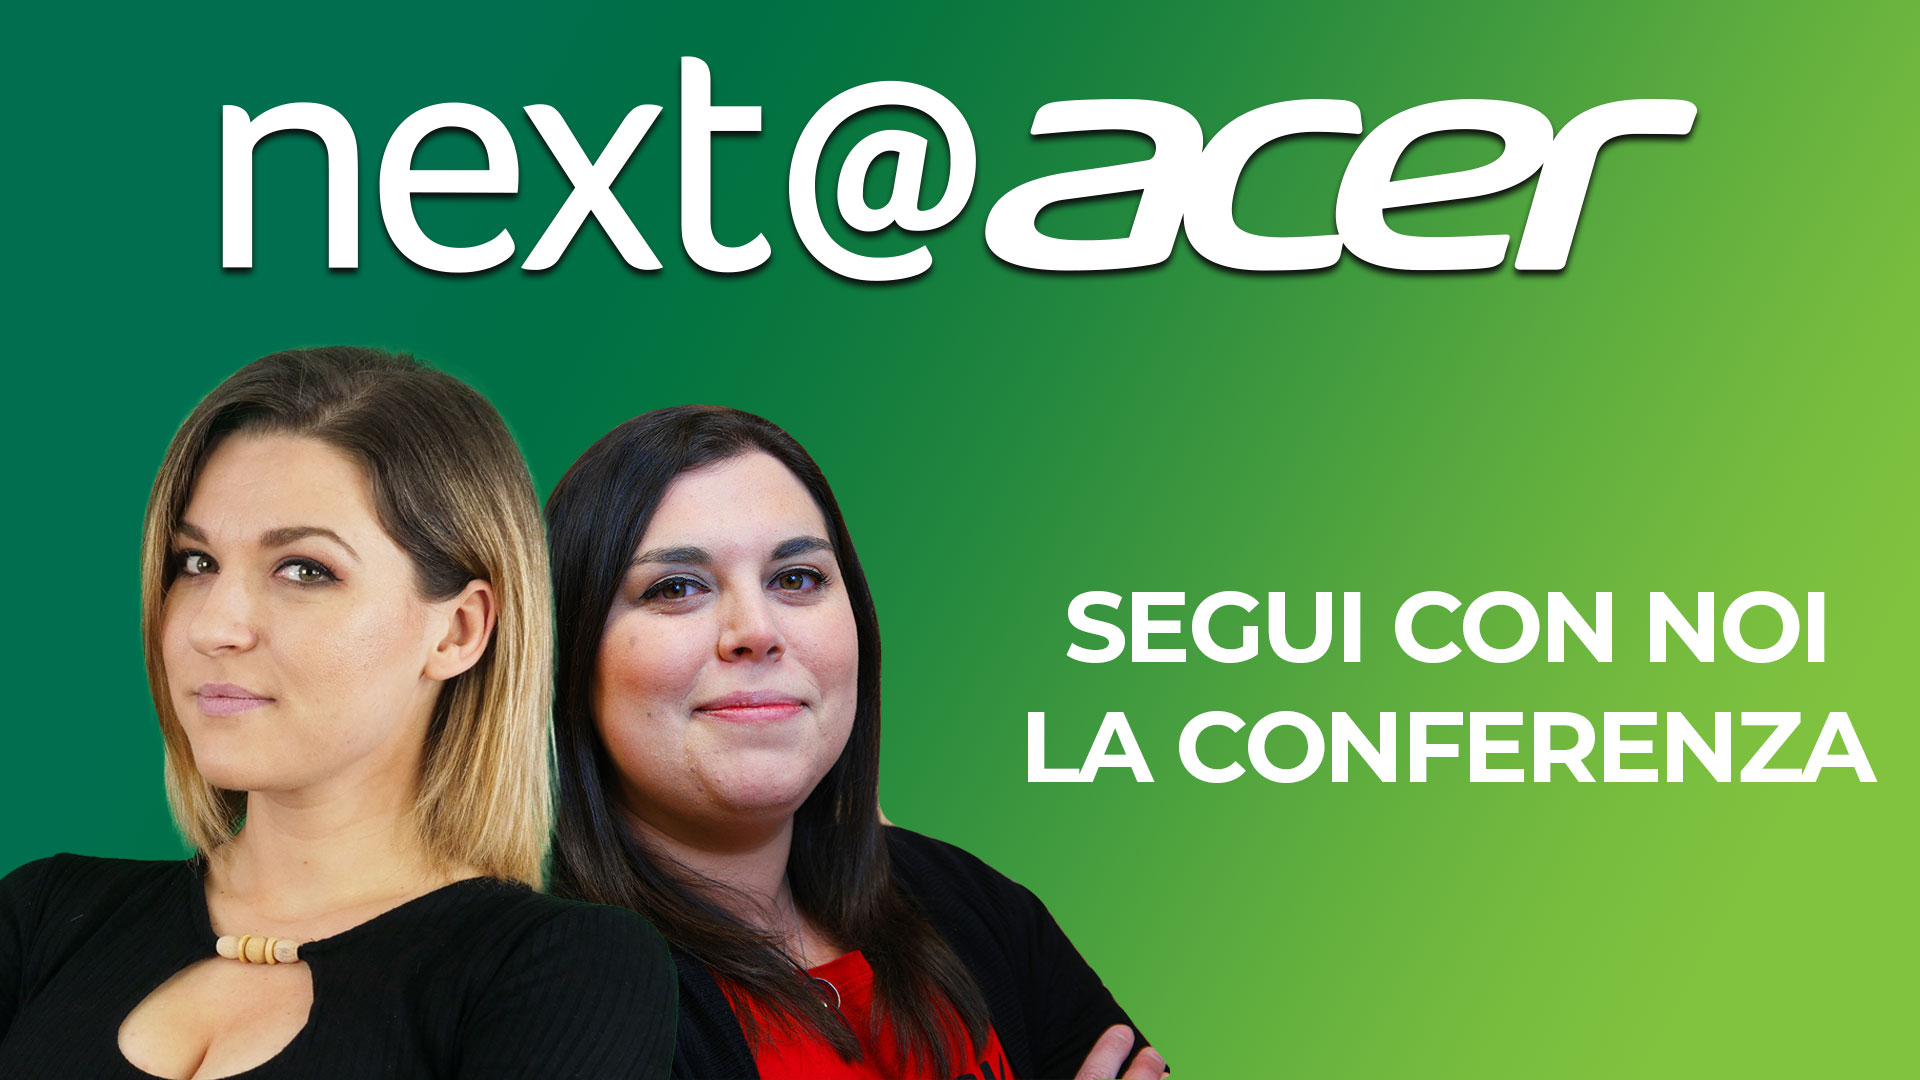 Next@Acer: segui con noi la conferenza thumbnail